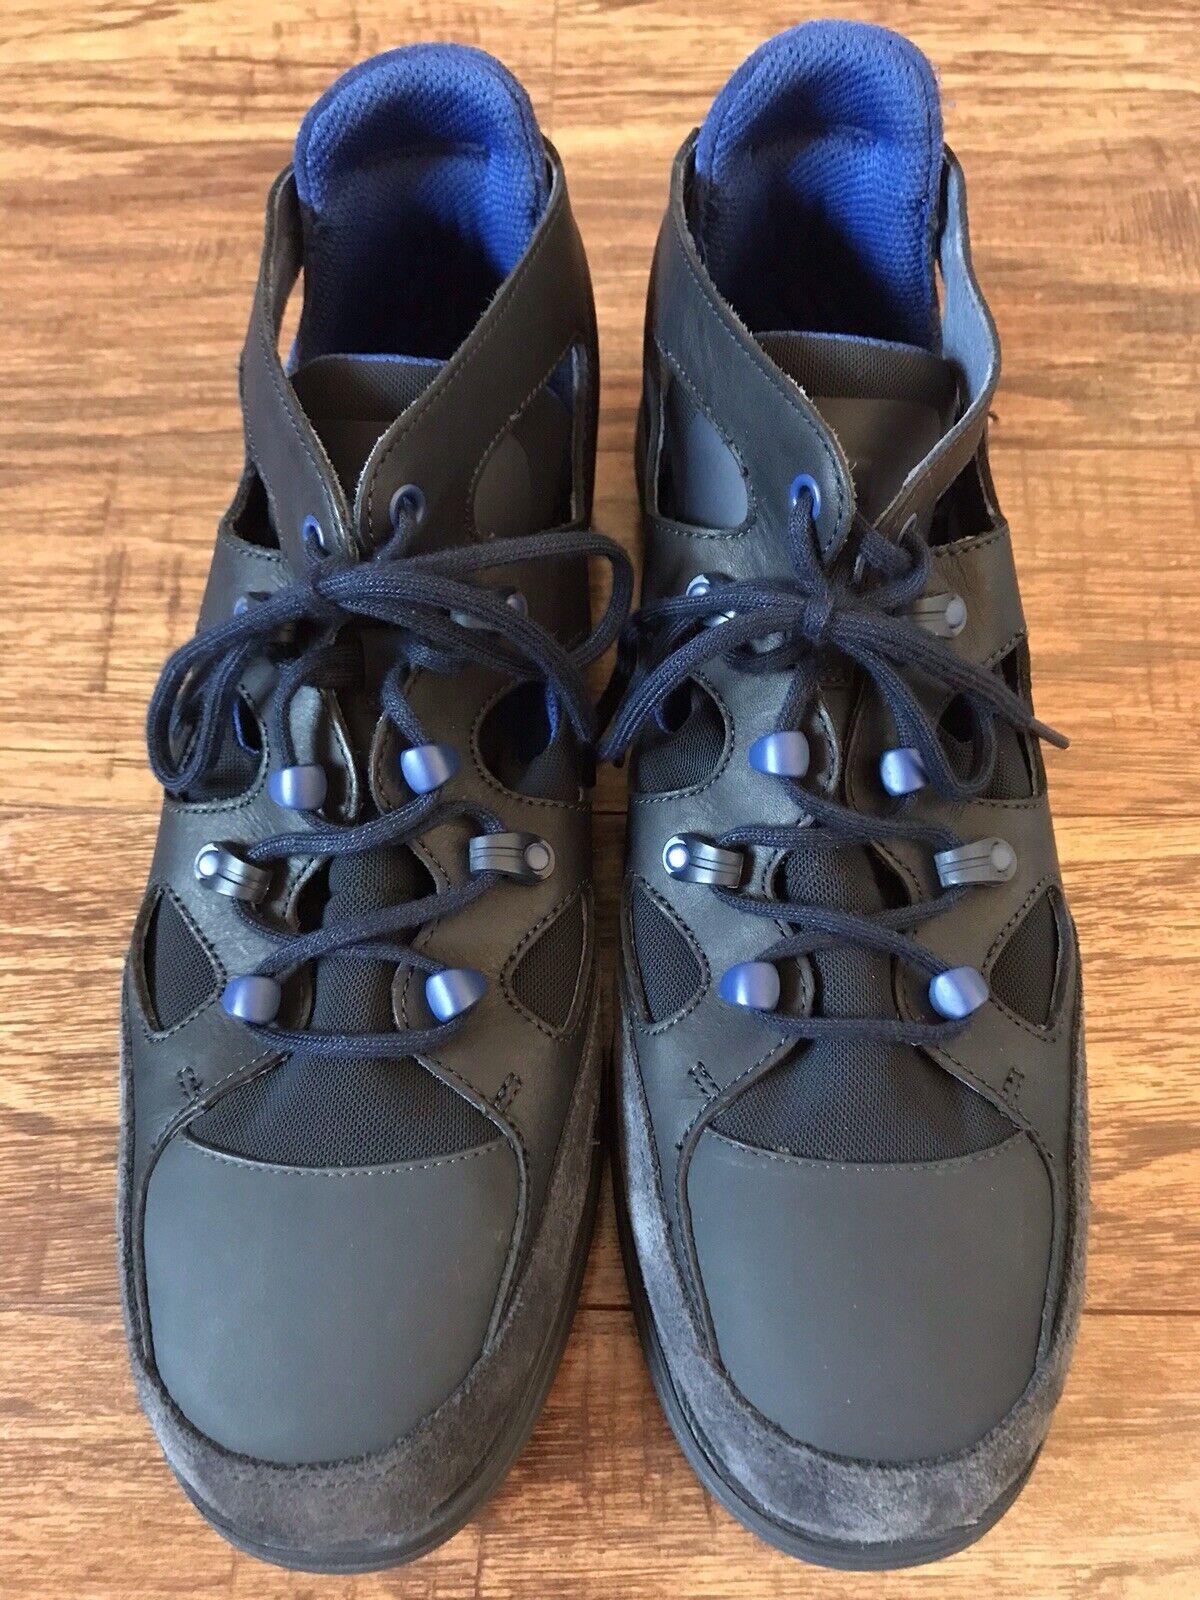 Camper Men's Atlhetic shoes Size 46 US New